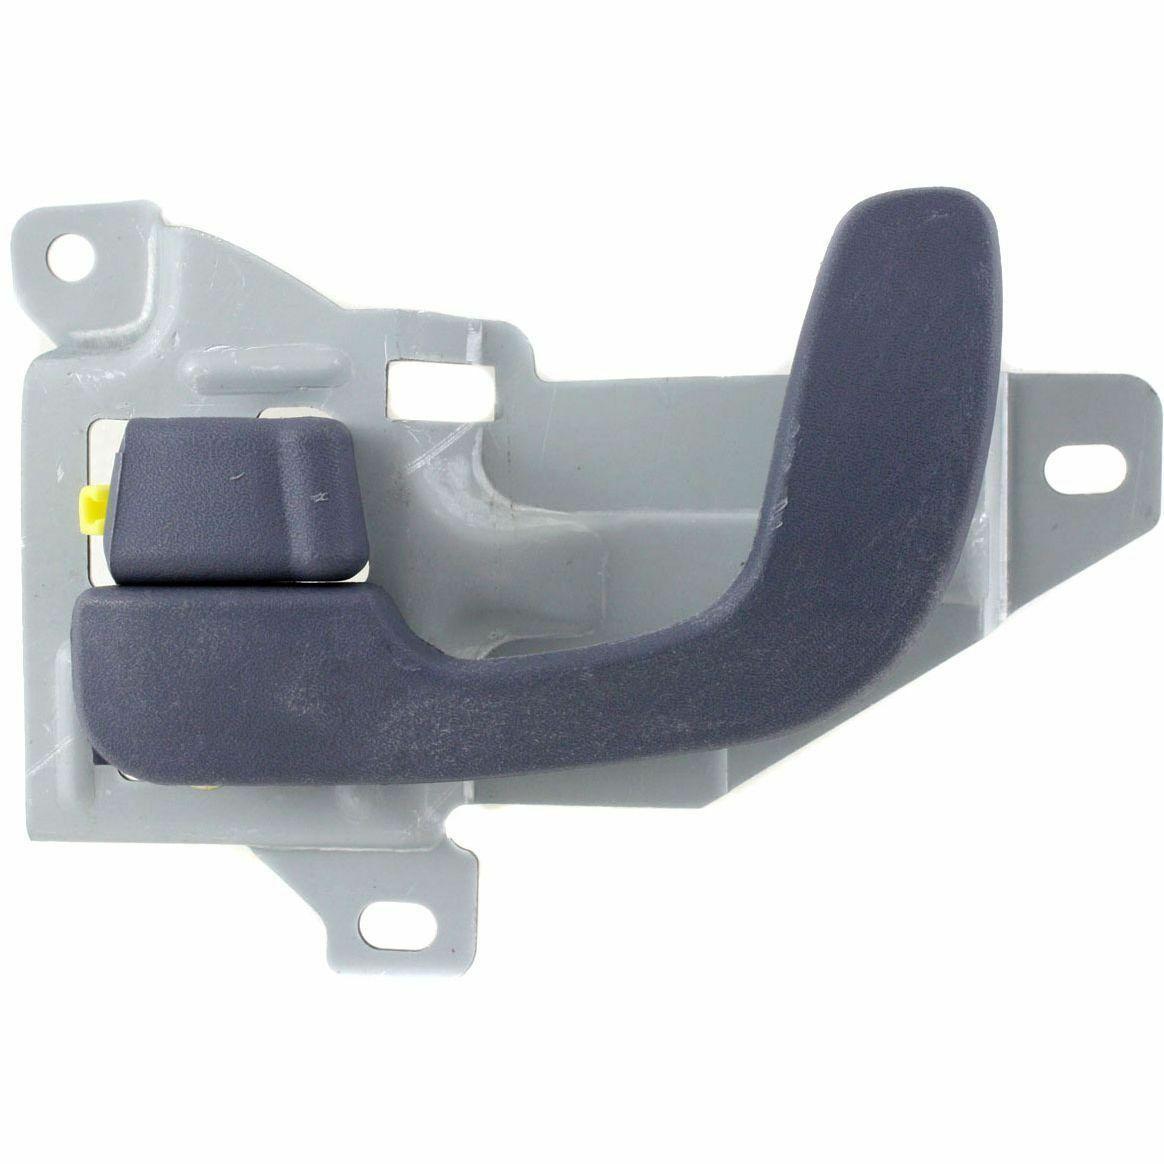 New Front LH Side Plastic Gray Interior Door Handle Fits Kia Rio Rio5 KI1352103